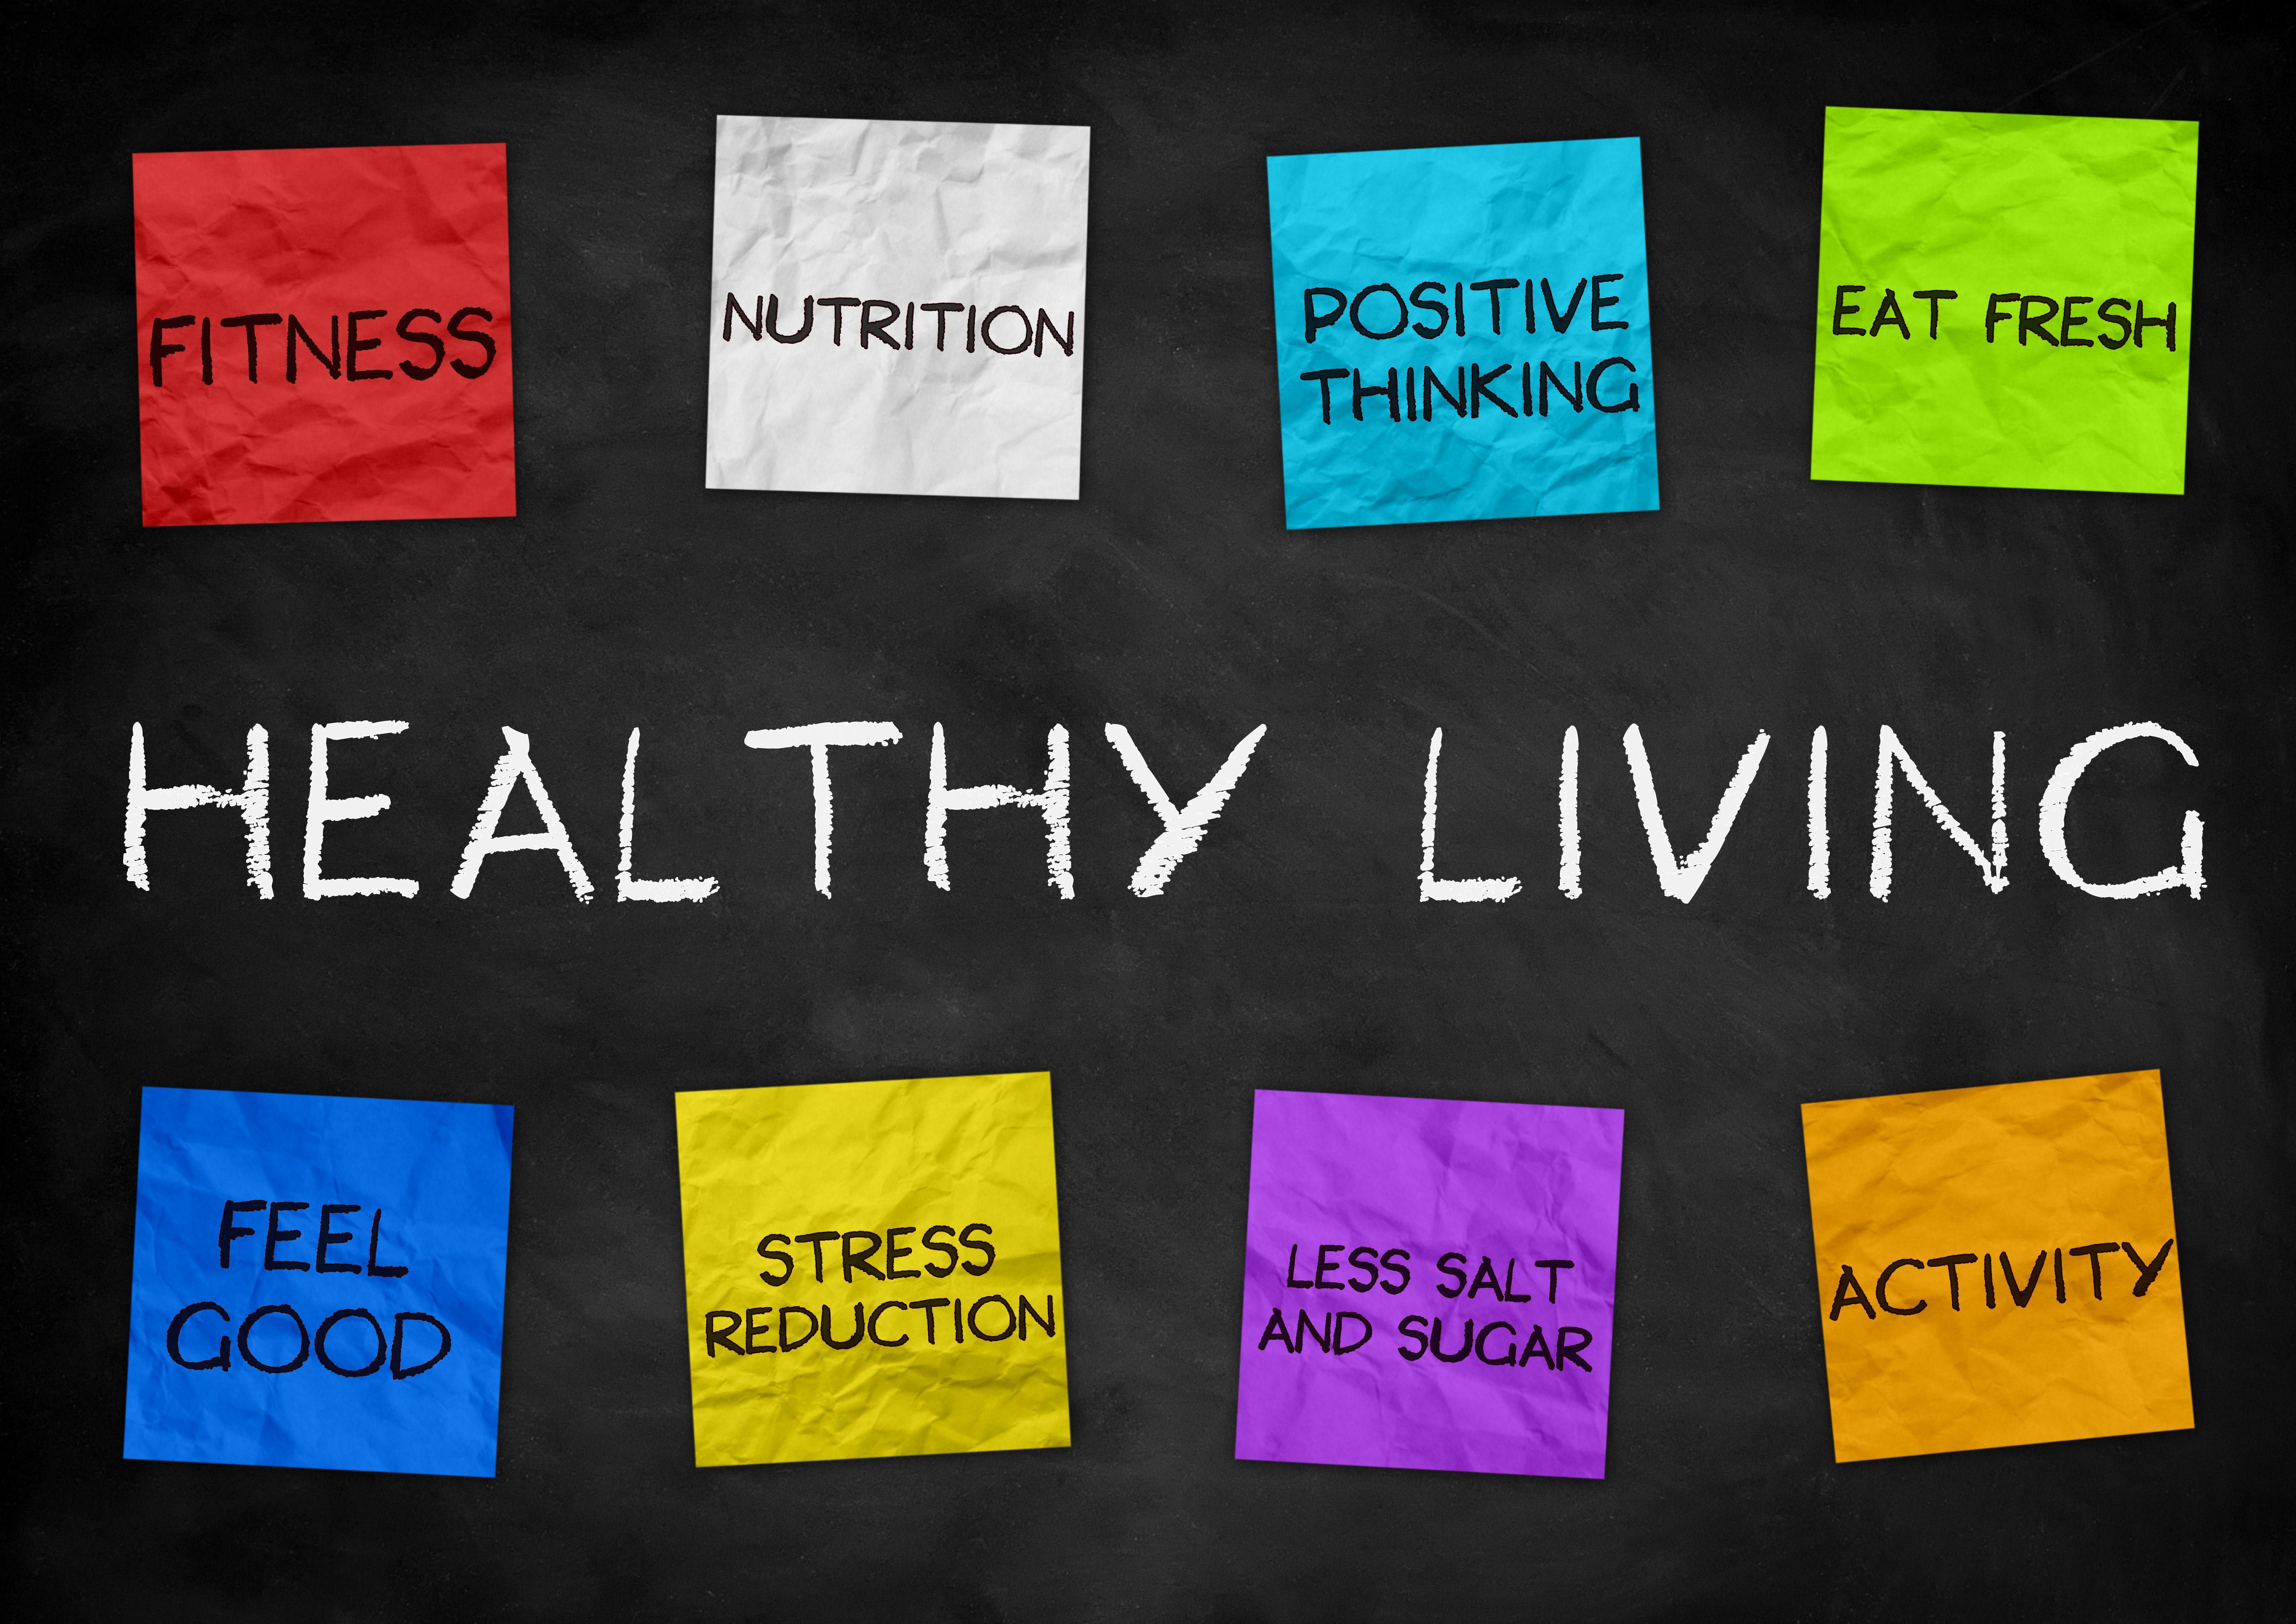 Healthy Living - illustration background